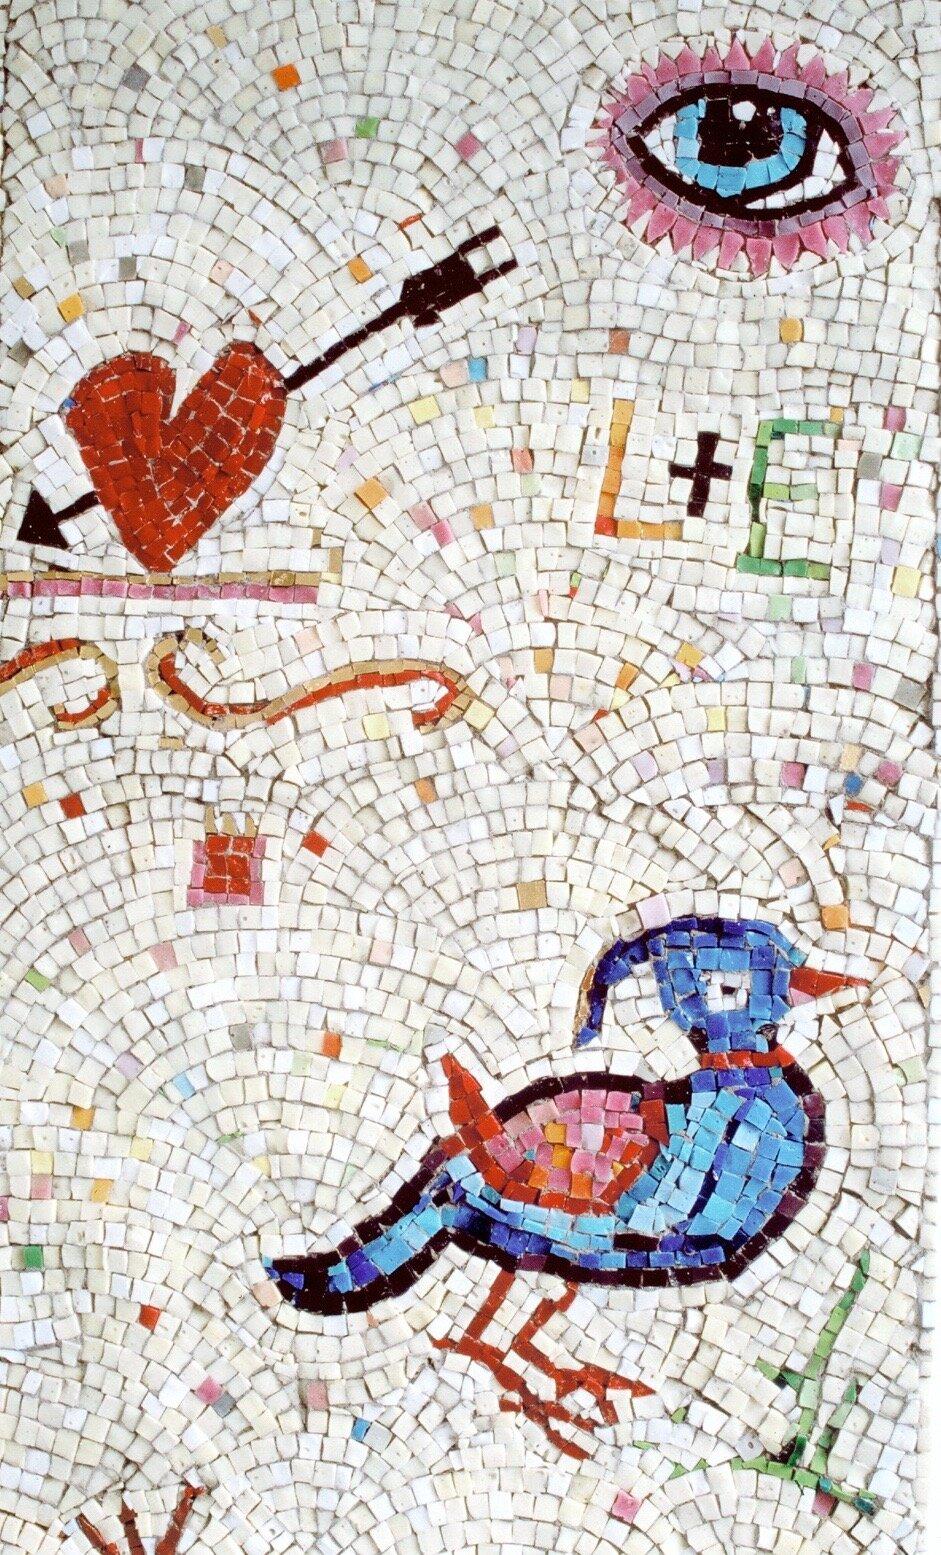 Mosaikksøyle, detalj